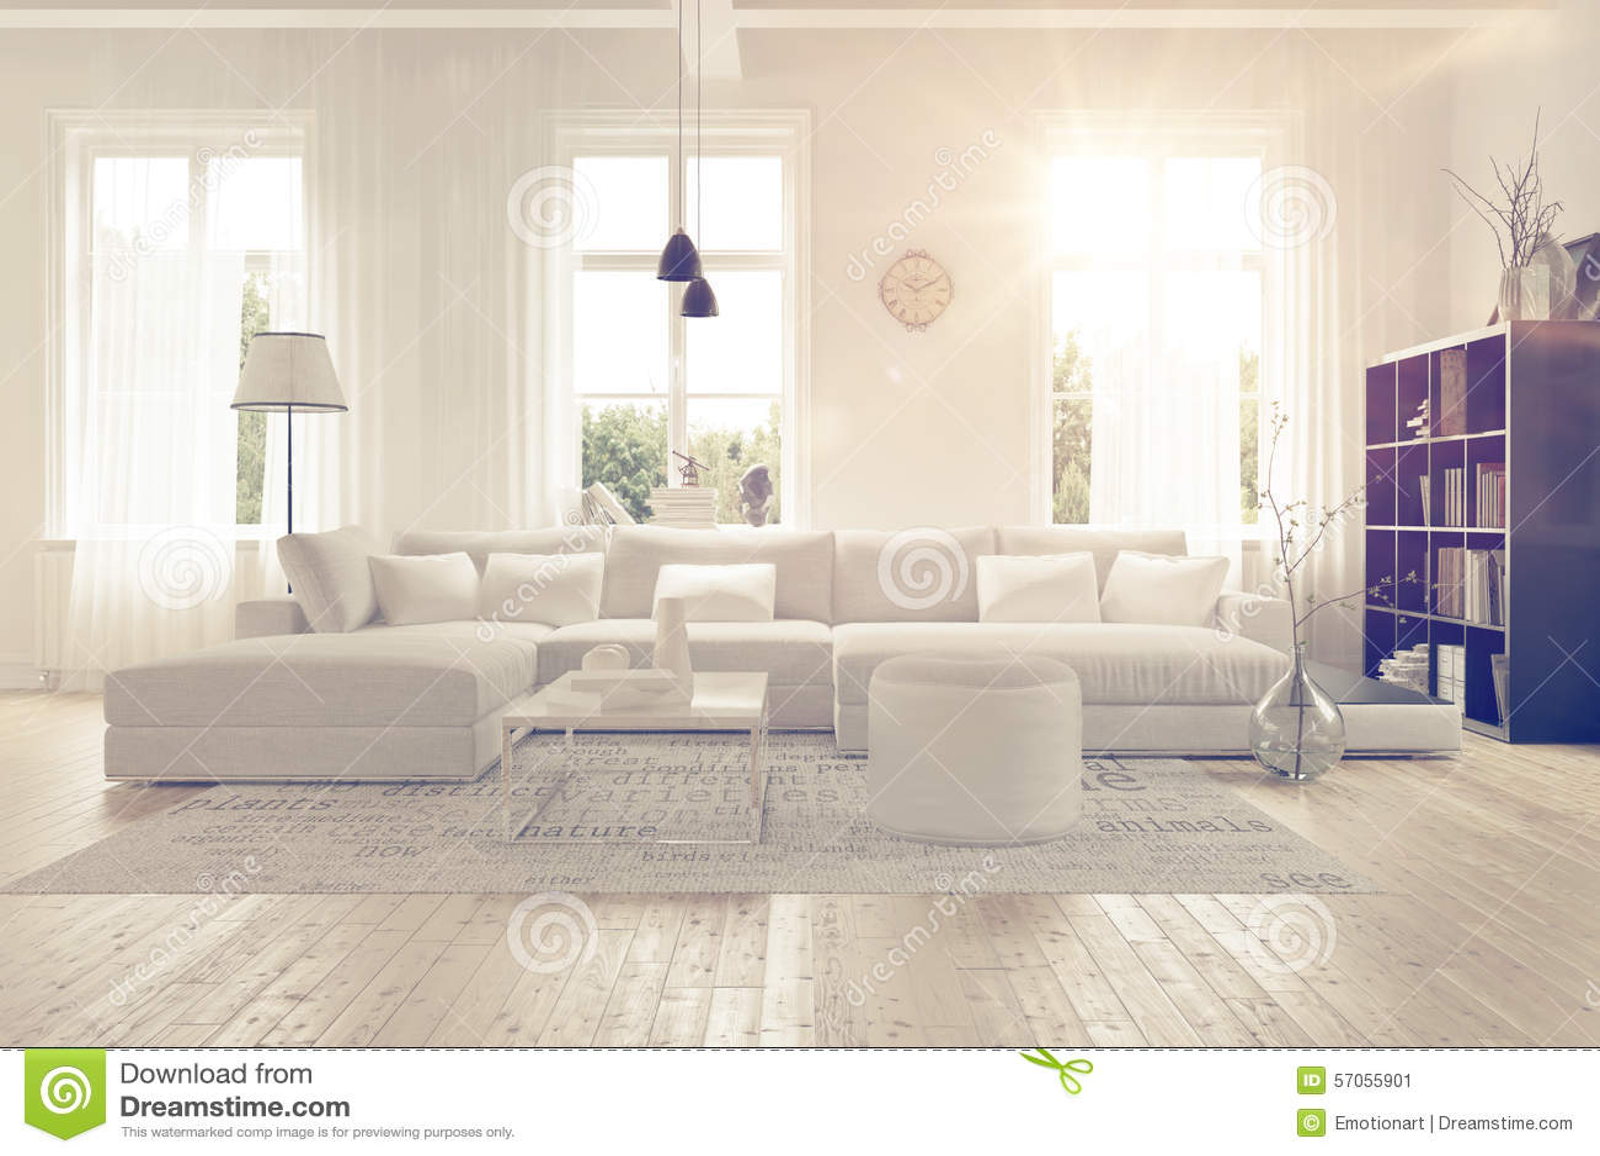 modern spacious white lounge interior stock illustration image 57055901. Black Bedroom Furniture Sets. Home Design Ideas